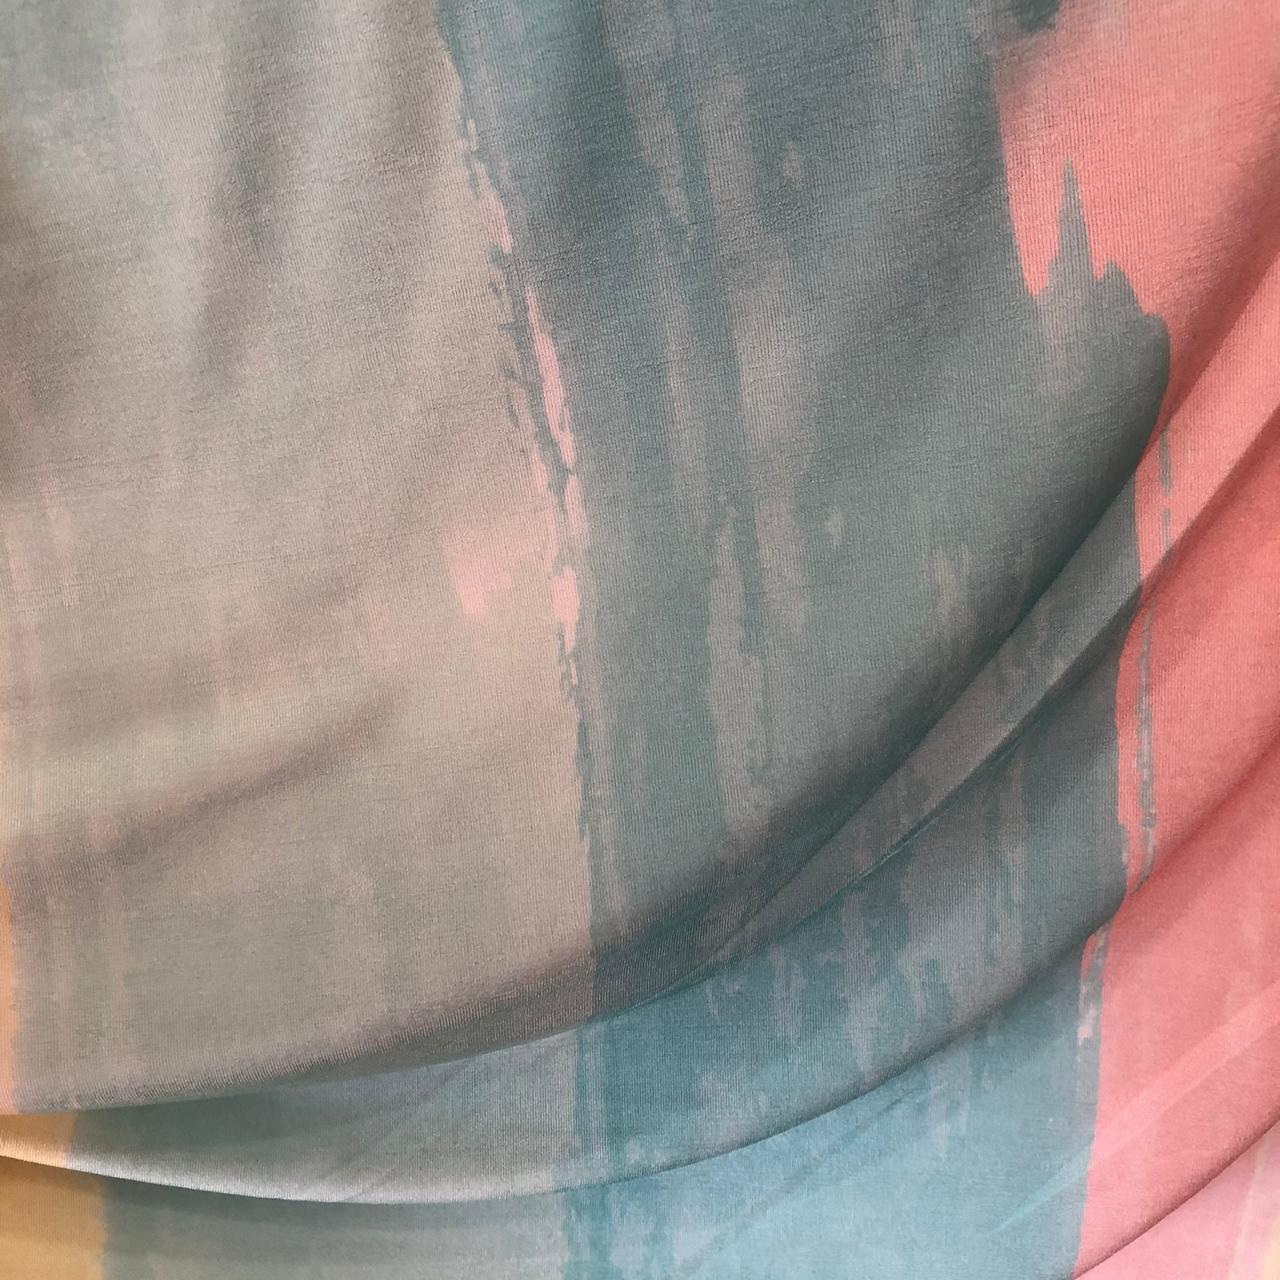 Tecido Malha Slinky Estampado 92%Poliéster 8%Elastano Tie Dye